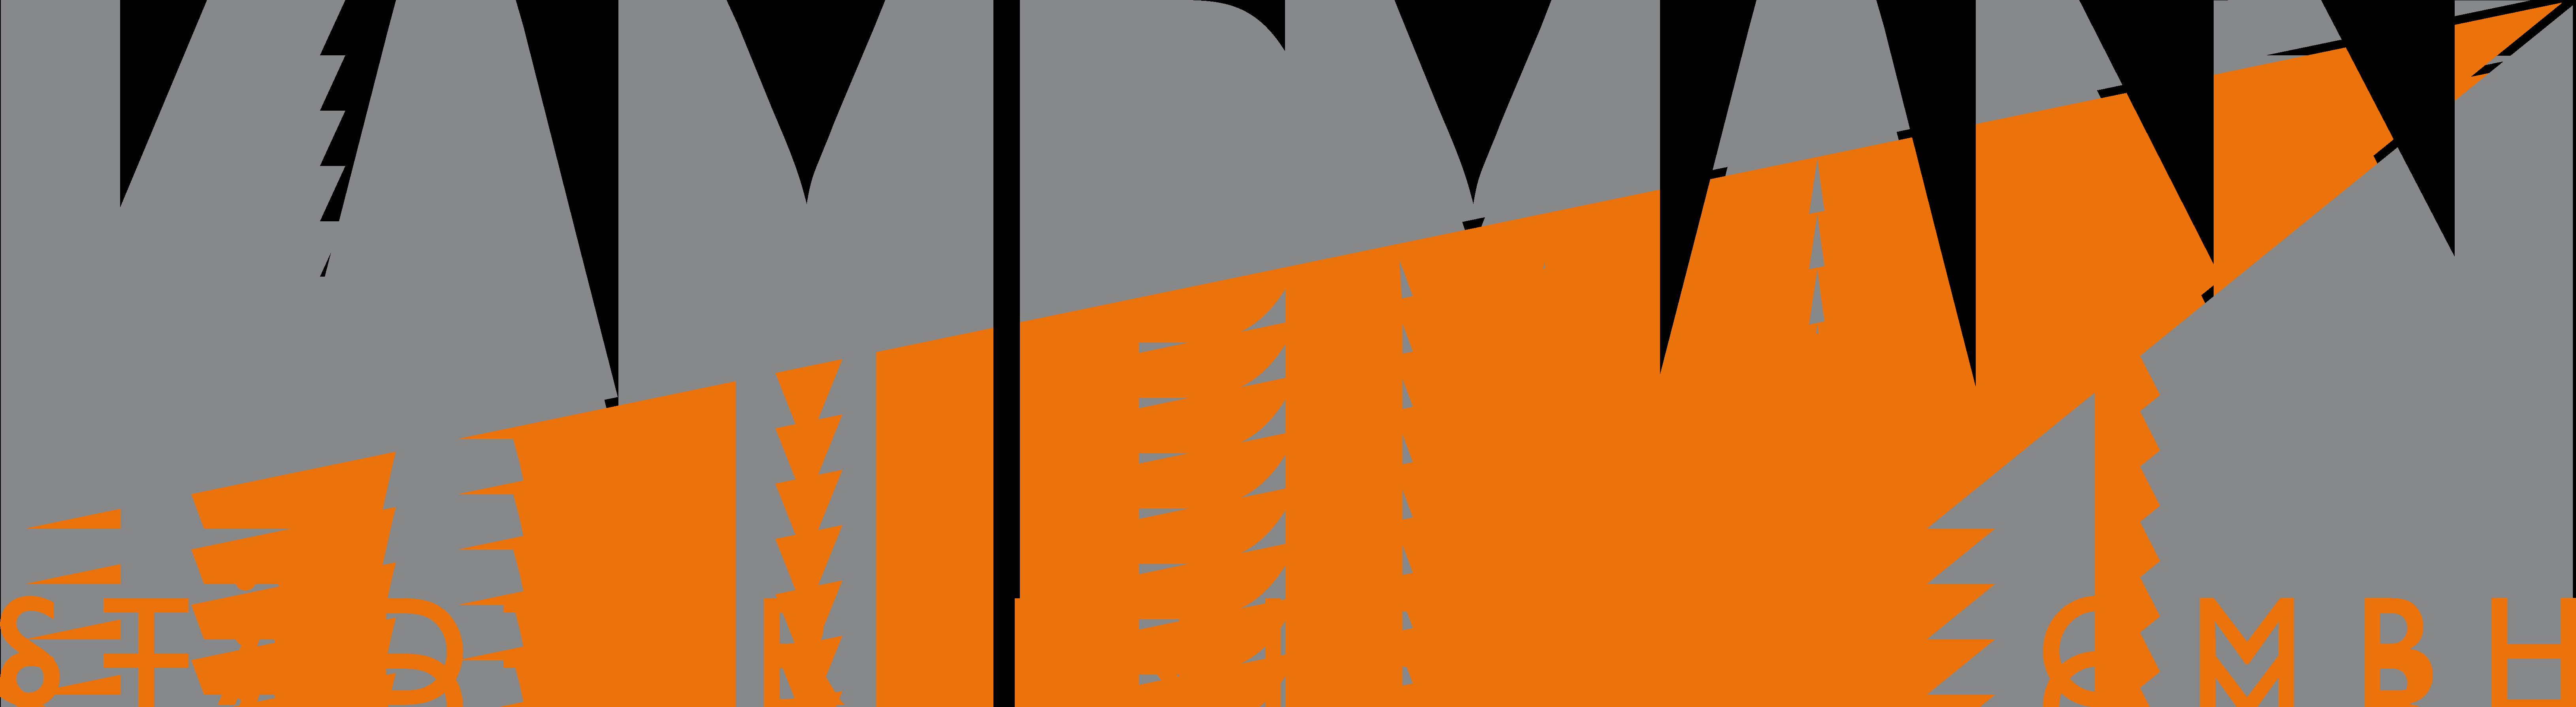 Kampmann Logo rgb